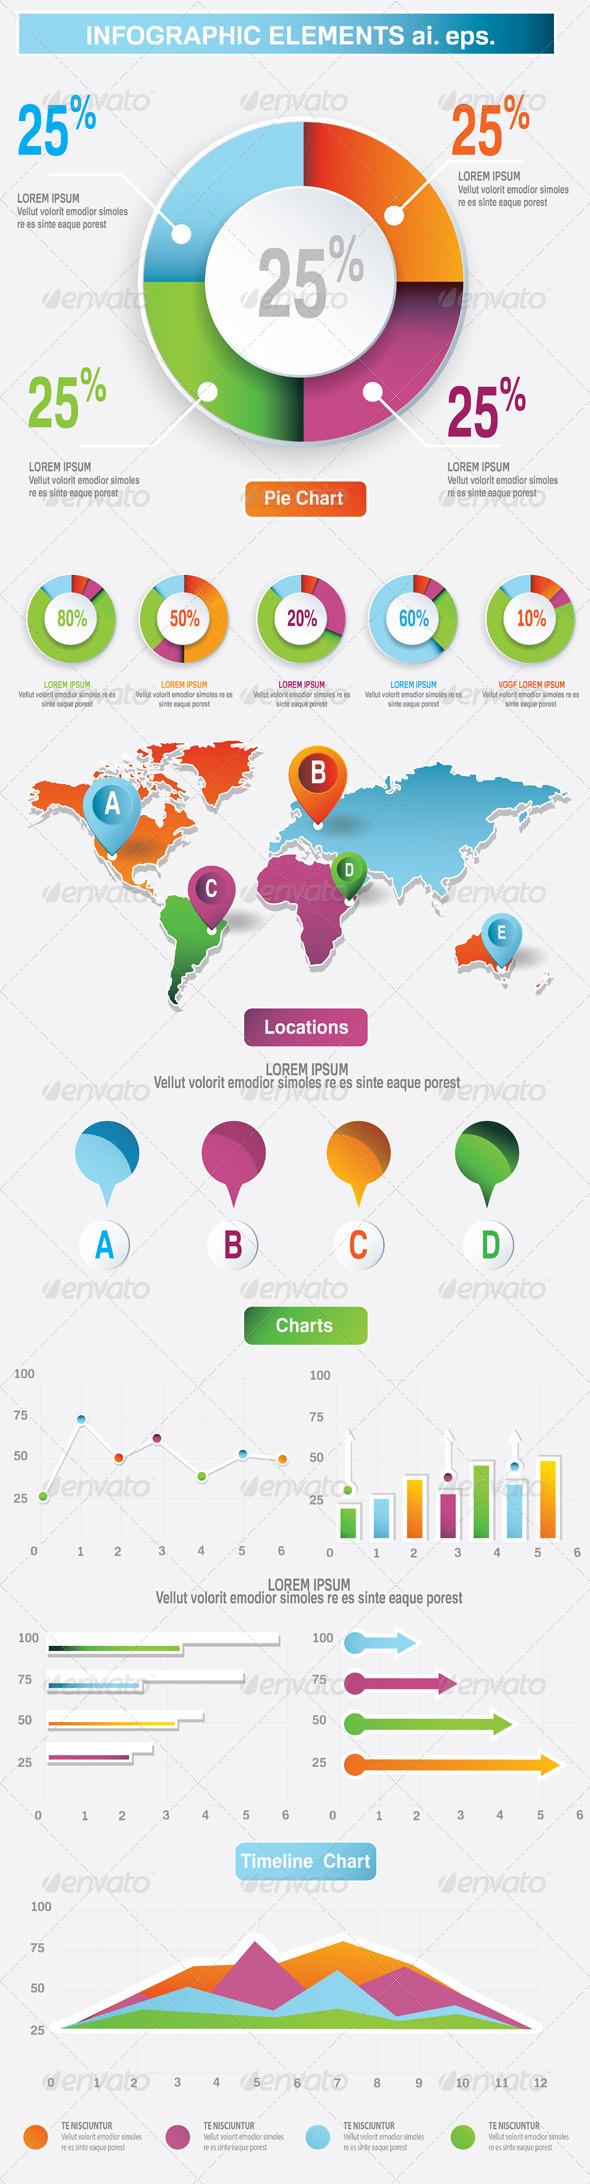 GraphicRiver Infographic Elements 4663552